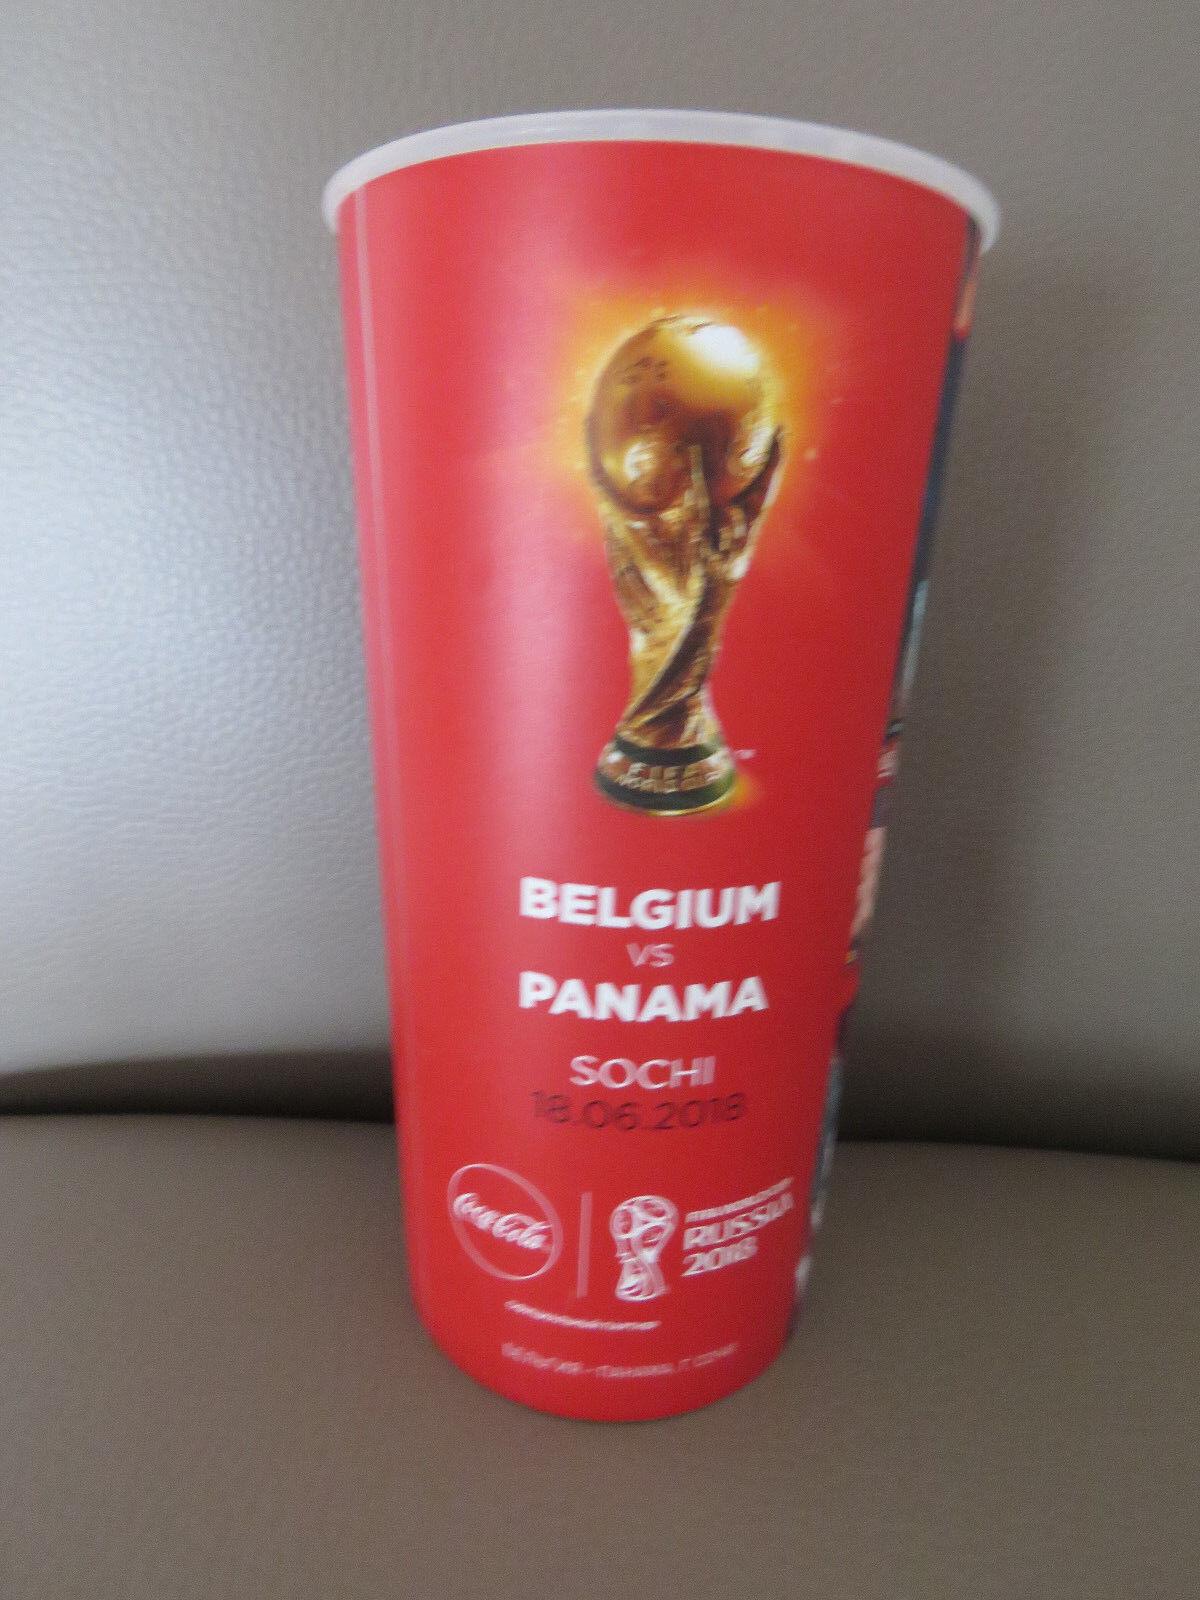 Gobelet Gobelet Gobelet du match Beer Cup 2018 FIFA World Cup Belgium Panama Diables Rouges ee182e